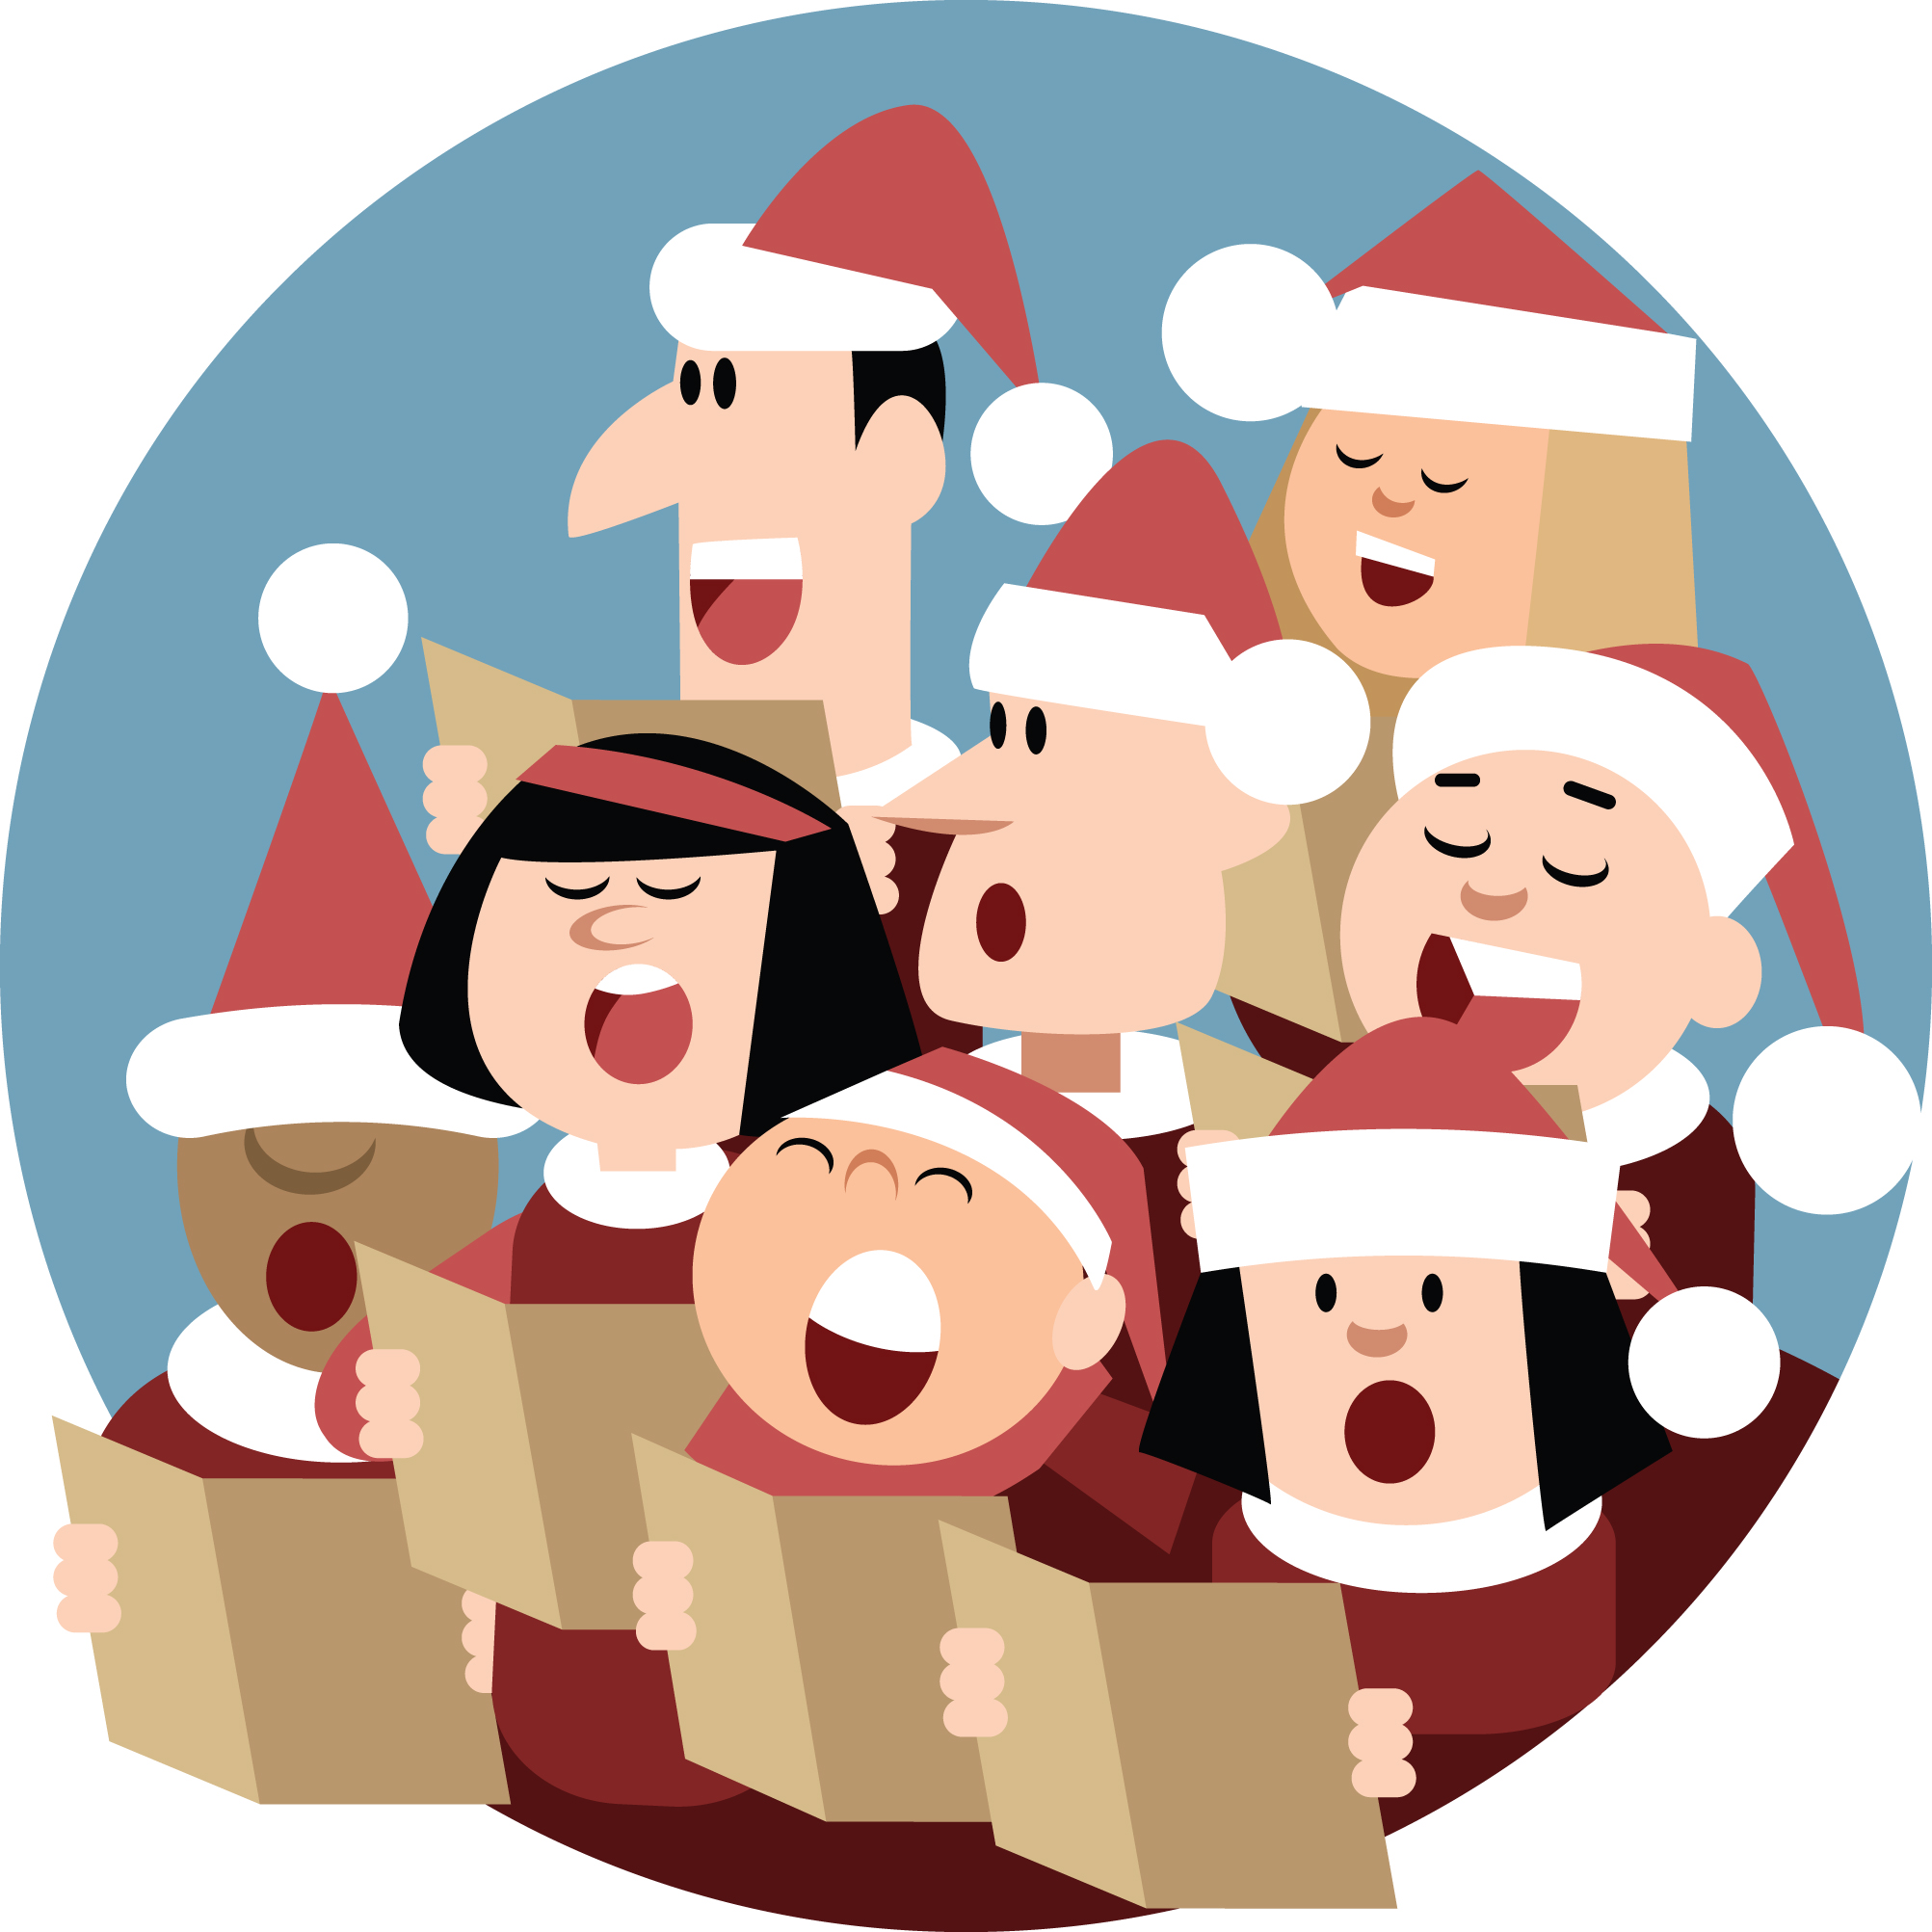 Caroling clipart group, Caroling group Transparent FREE for.